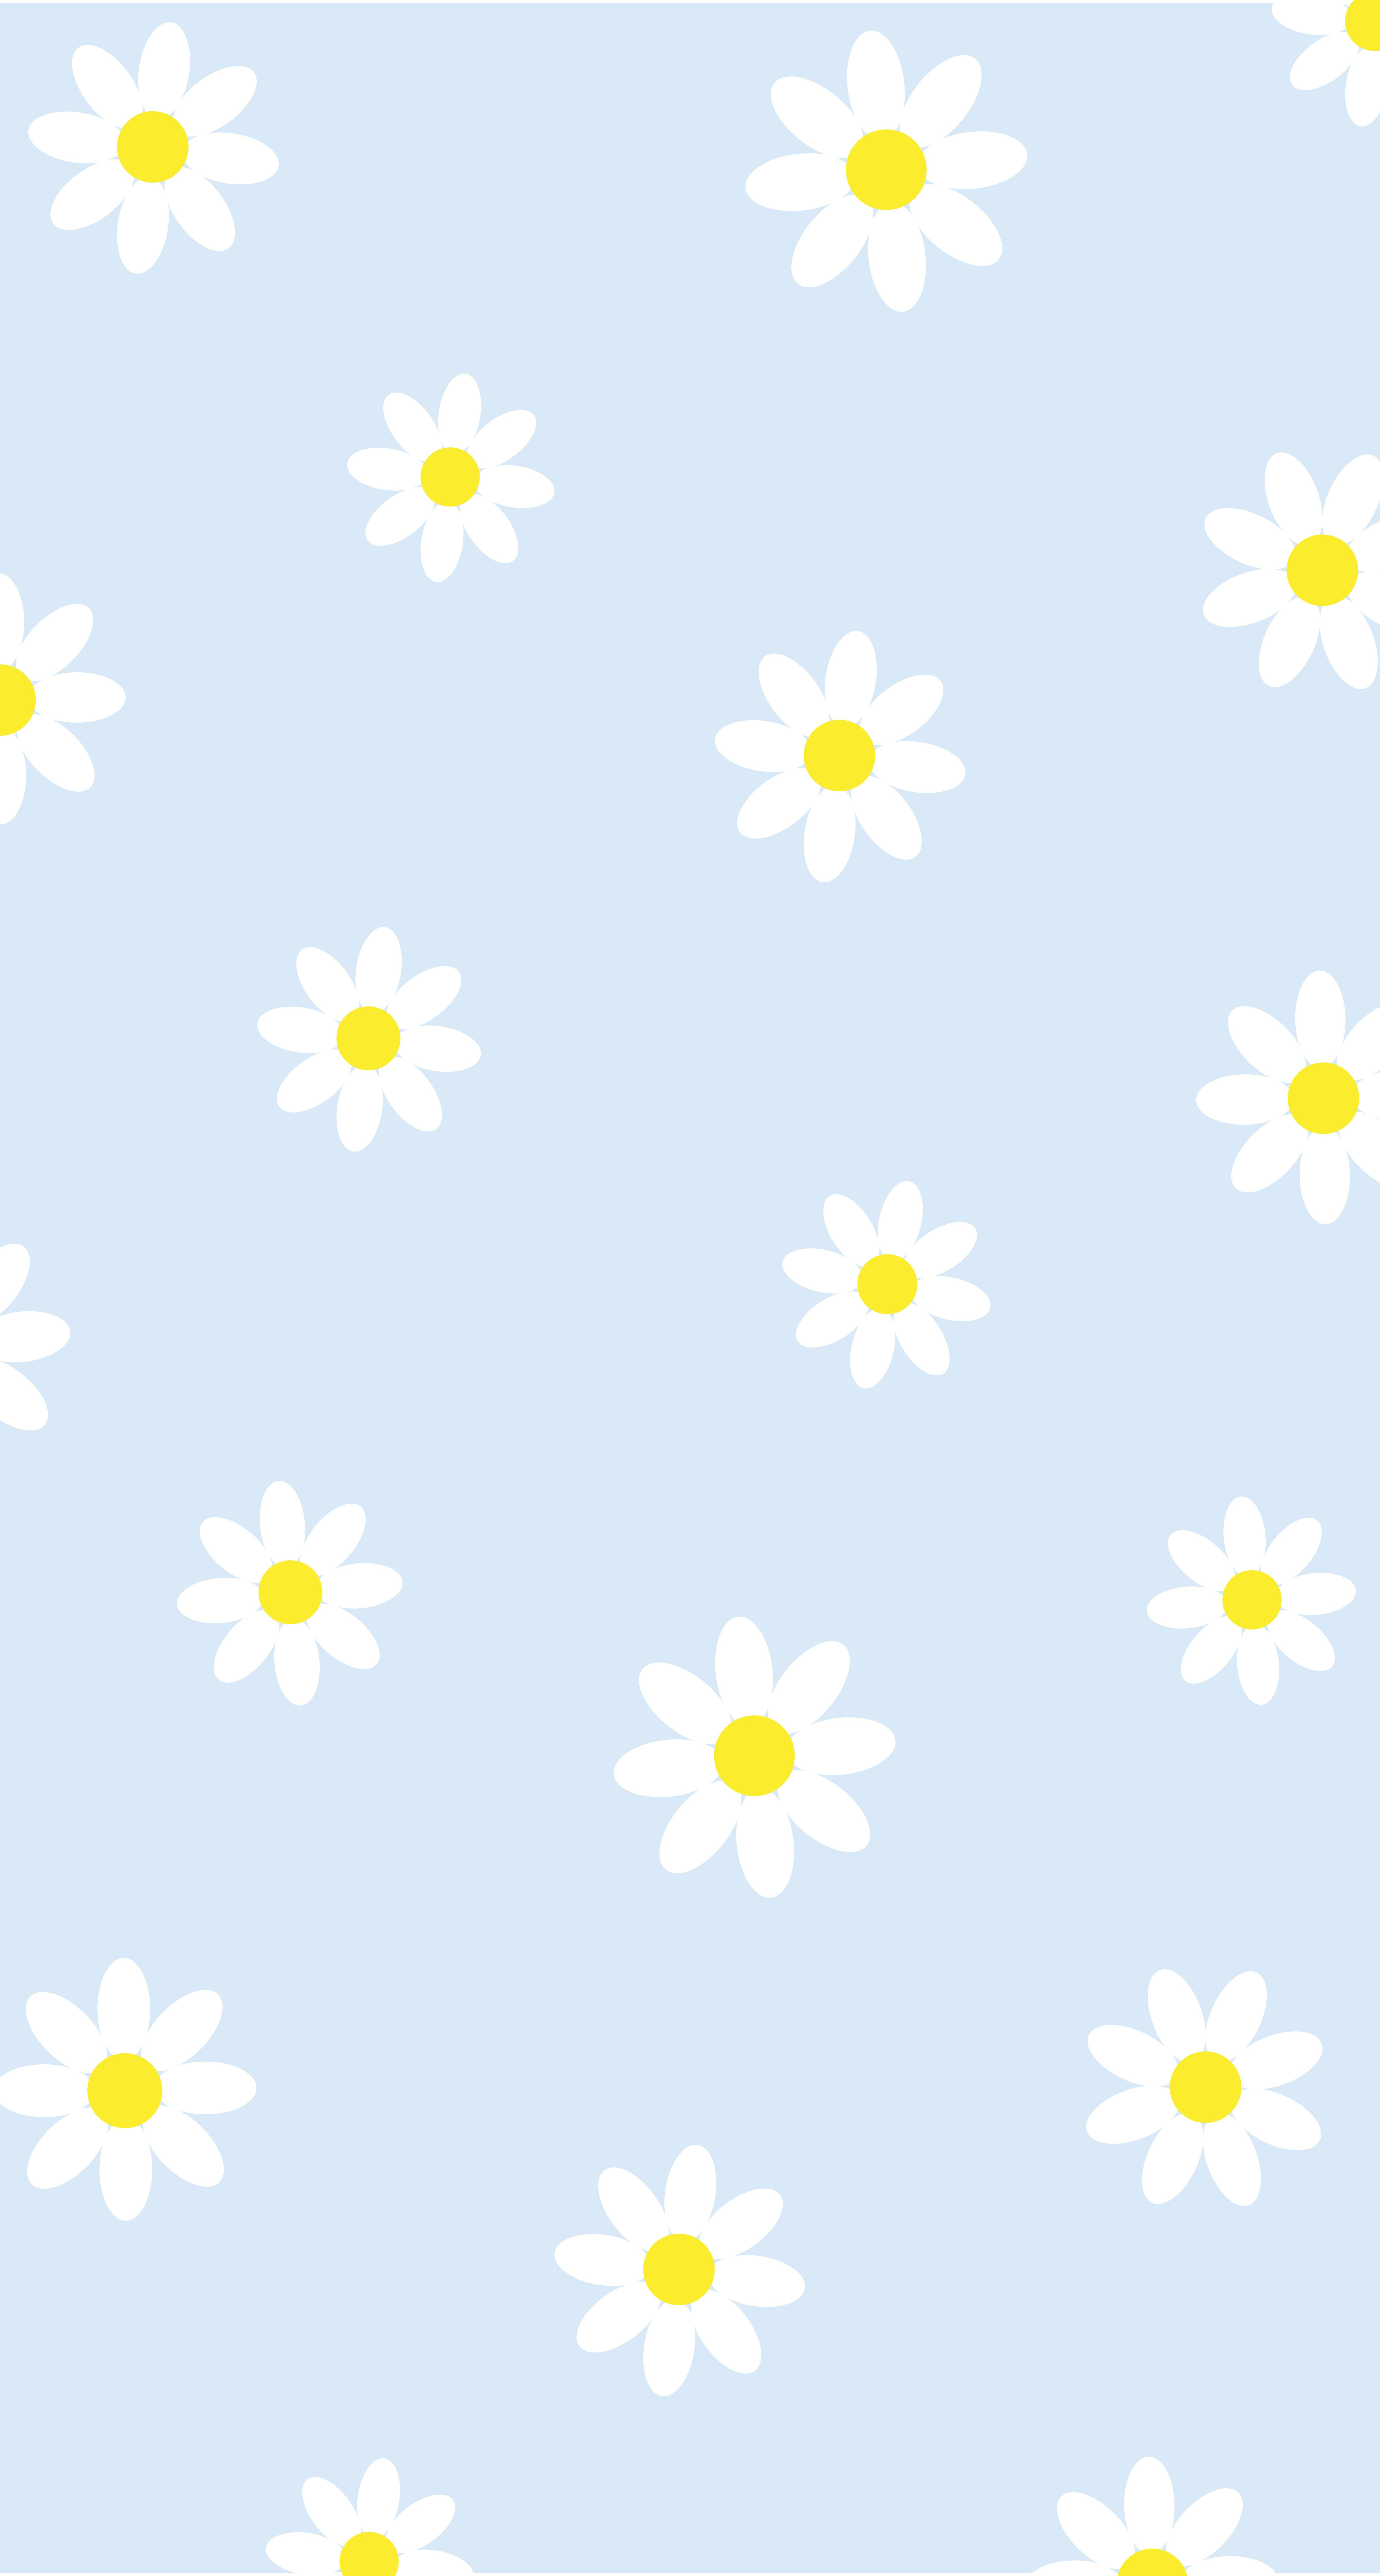 Cute Daisy Pattern In 2021 Floral Print Wallpaper Simple Iphone Wallpaper Daisy Wallpaper